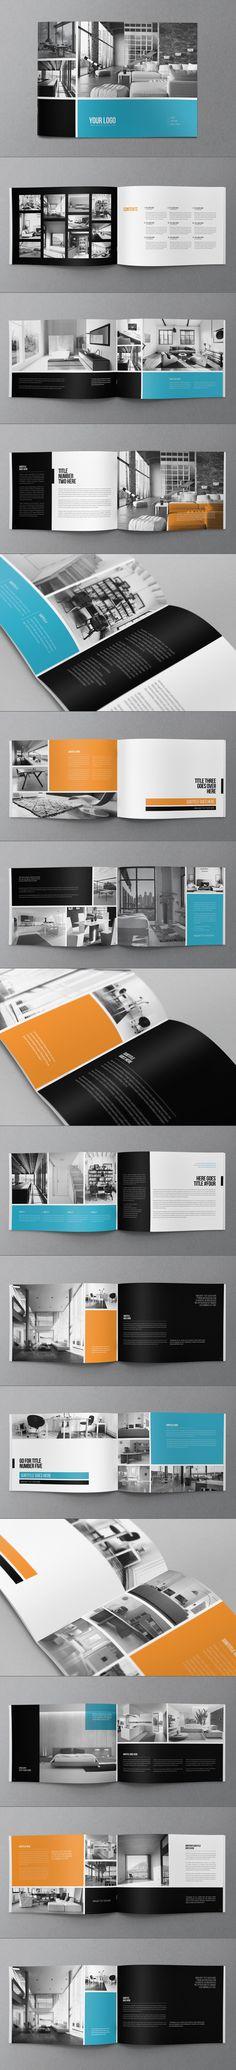 Minimal Modern Brochure. Download here: http://graphicriver.net/item/minimal-modern-brochure/8819275?ref=abradesign #brochure #design